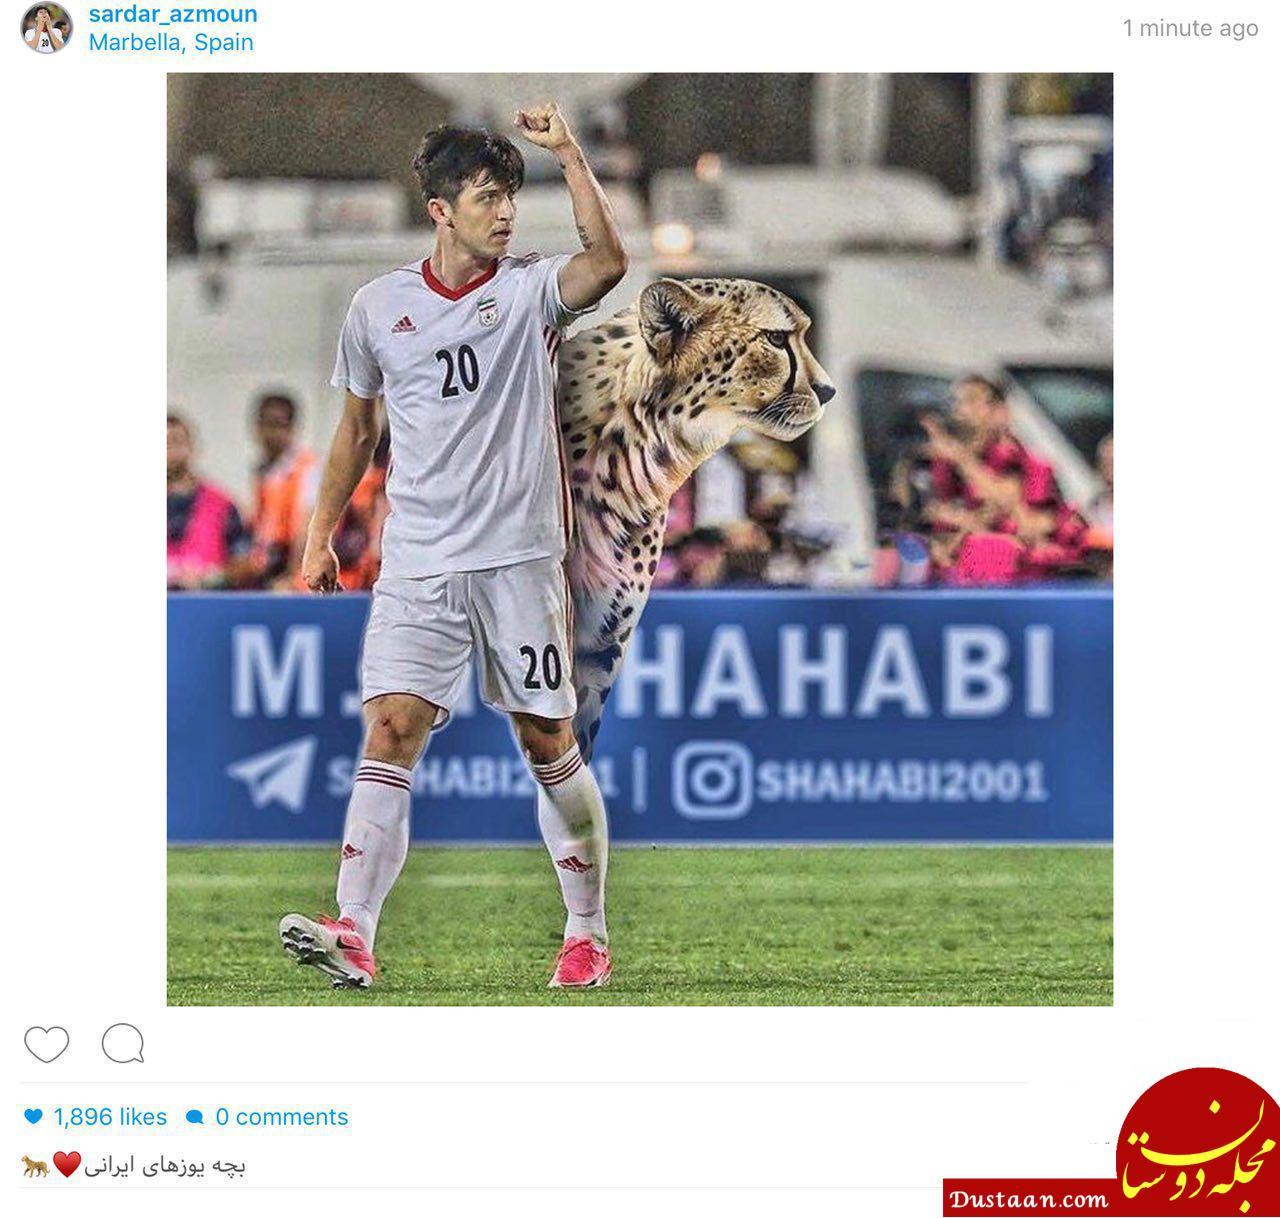 www.dustaan.com واکنش سردار آزمون به بازی های استقلال و پرسپولیس +عکس